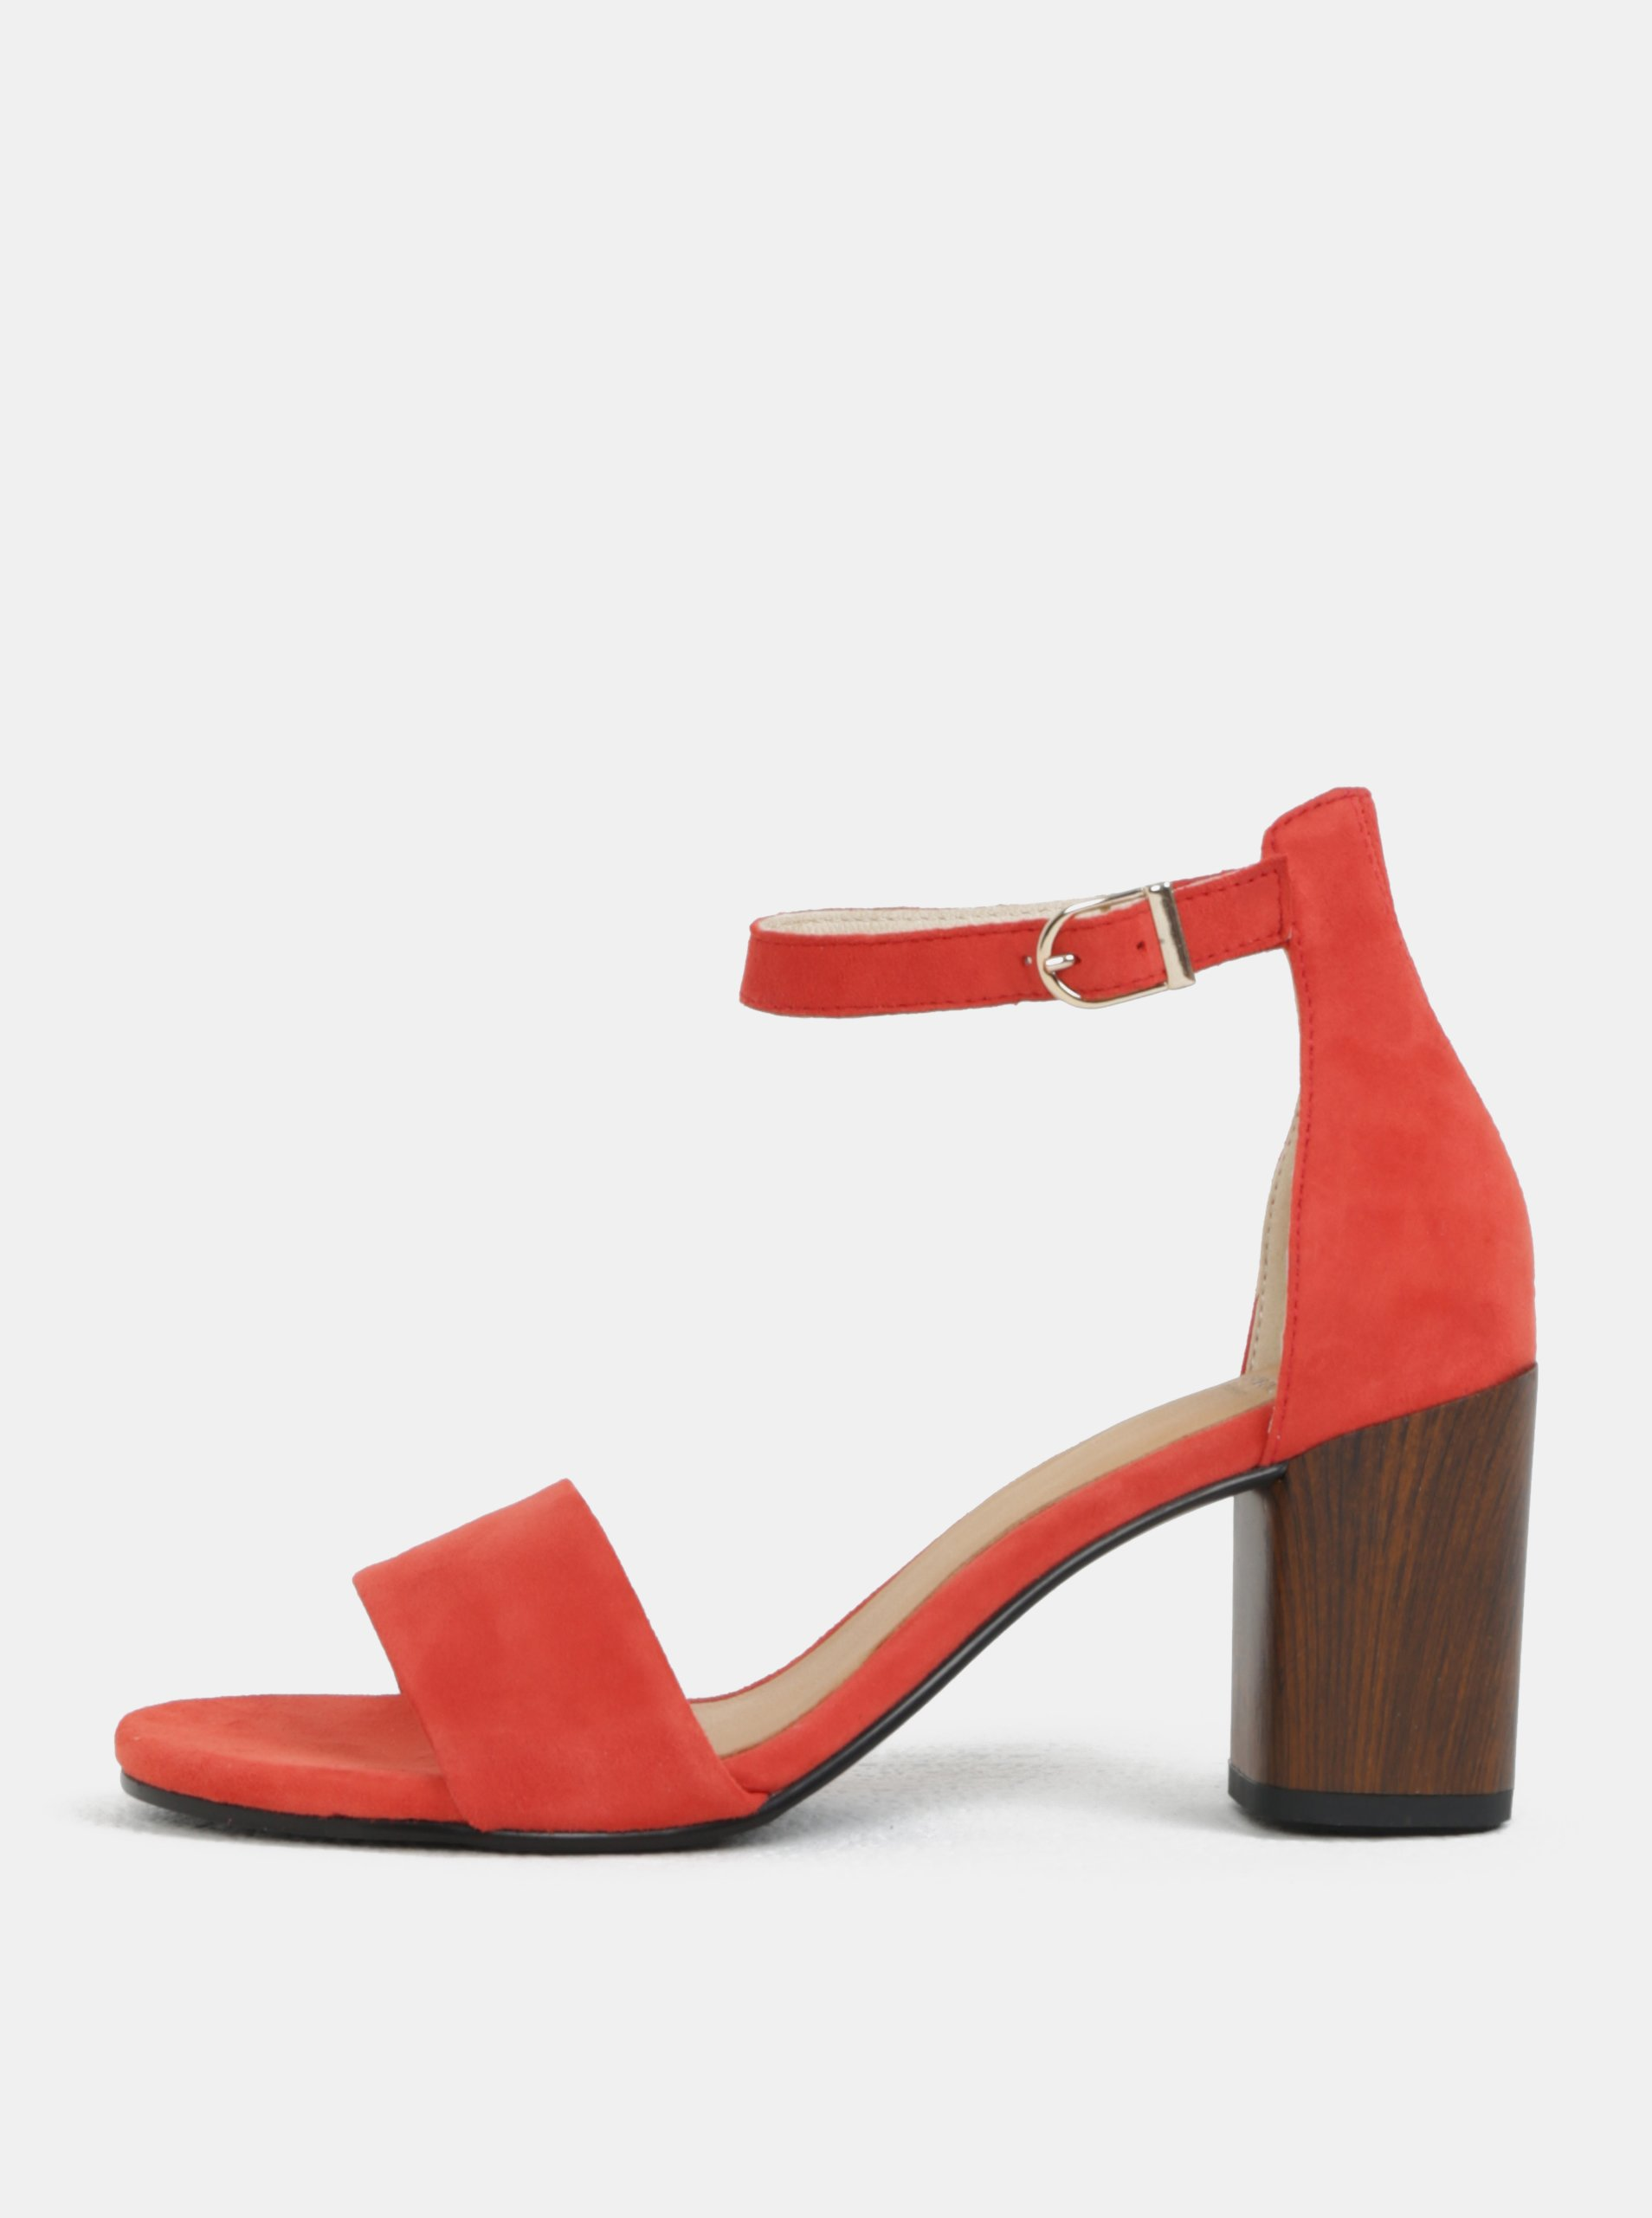 81bbed44db4f Červené dámske semišové sandálky na podpätku Vagabond Carol